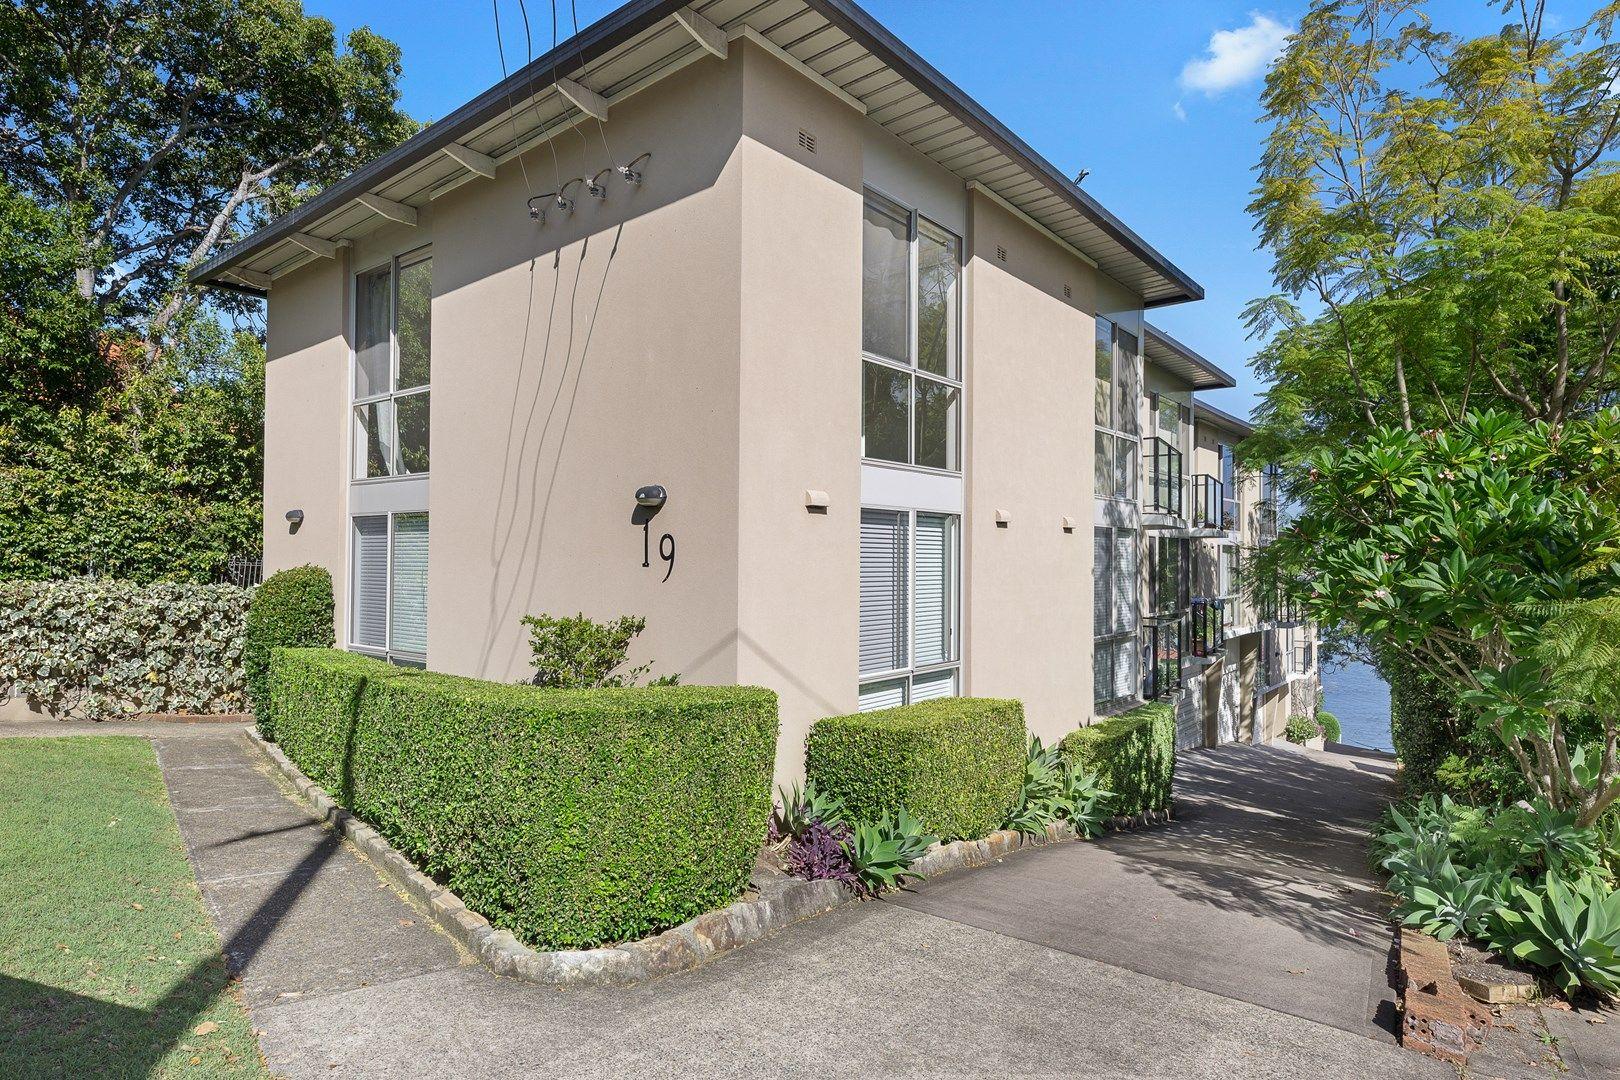 10/19 Dick Street, Henley NSW 2111, Image 0